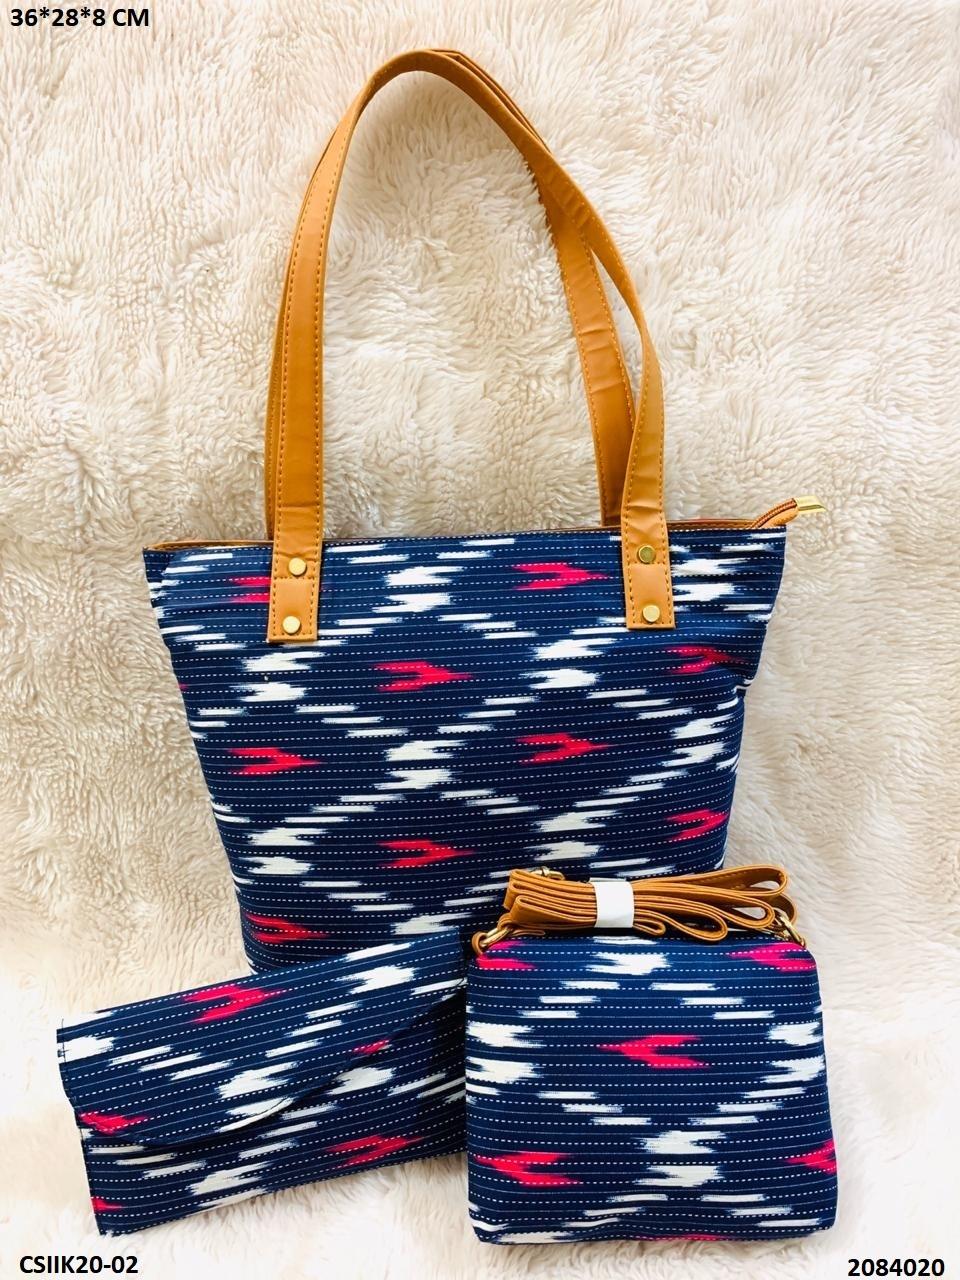 Handmade Printed Ikkat Bags